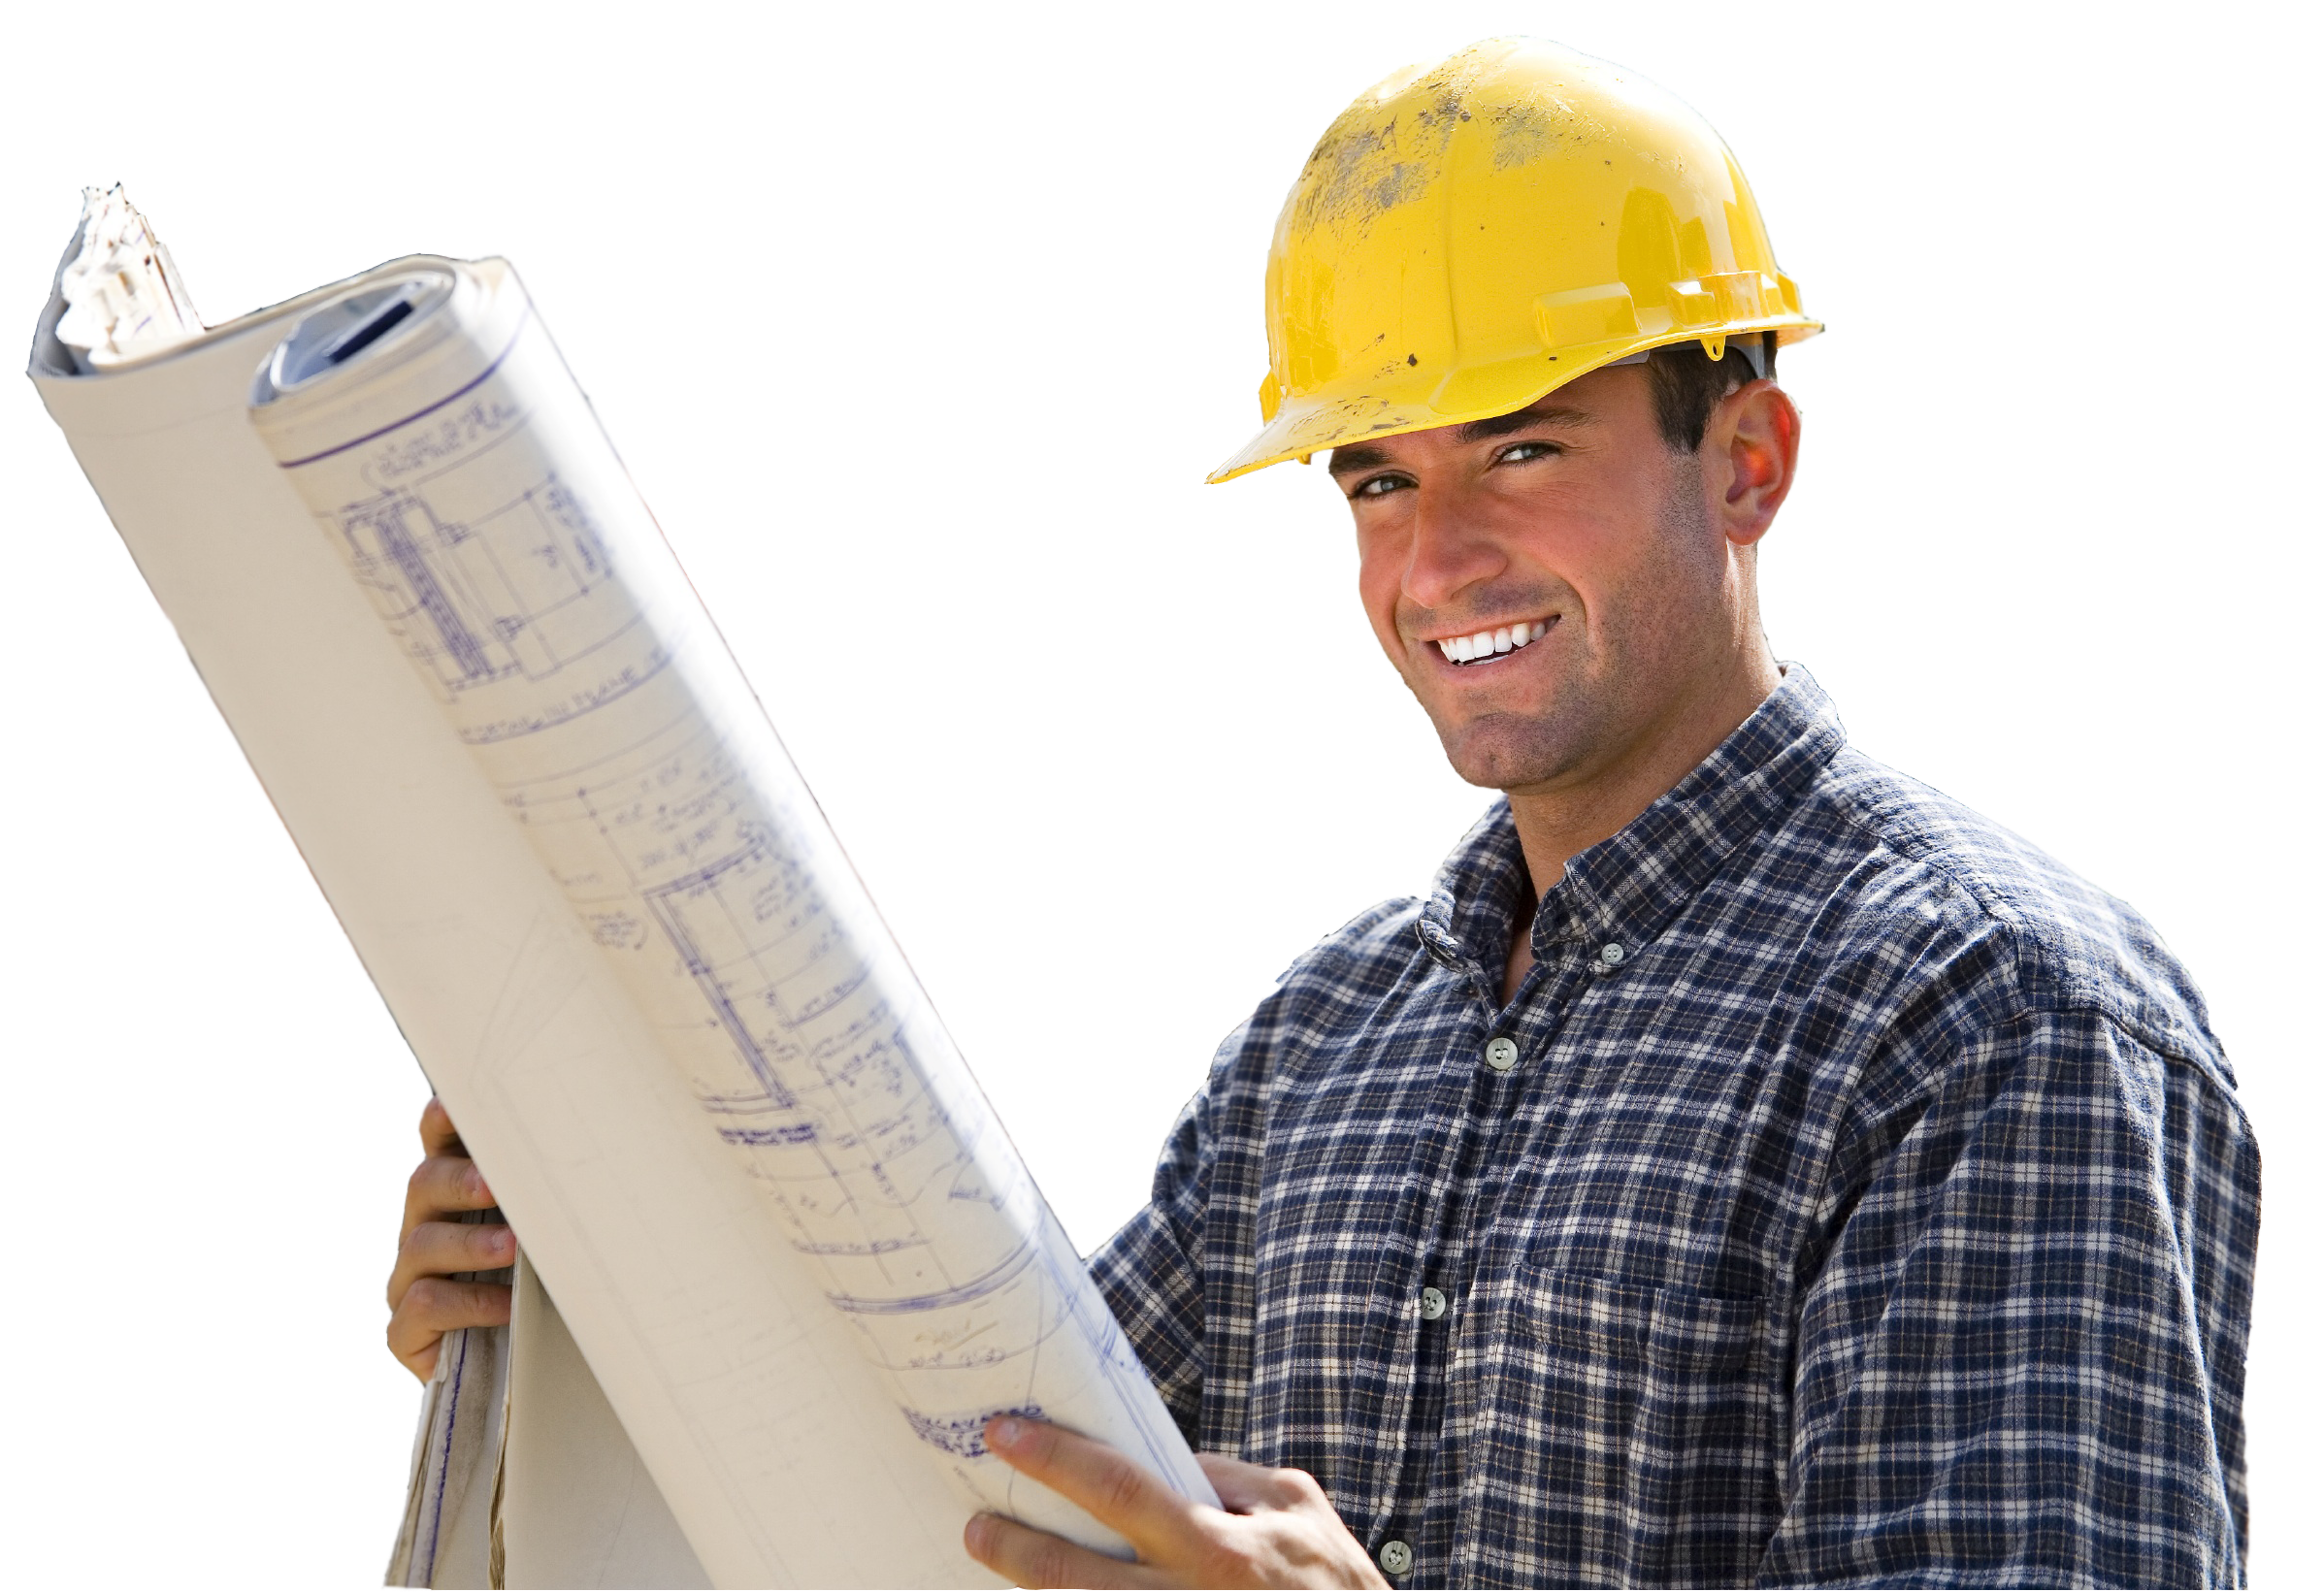 3-Annual-Survey-Tracks-Builder-Views